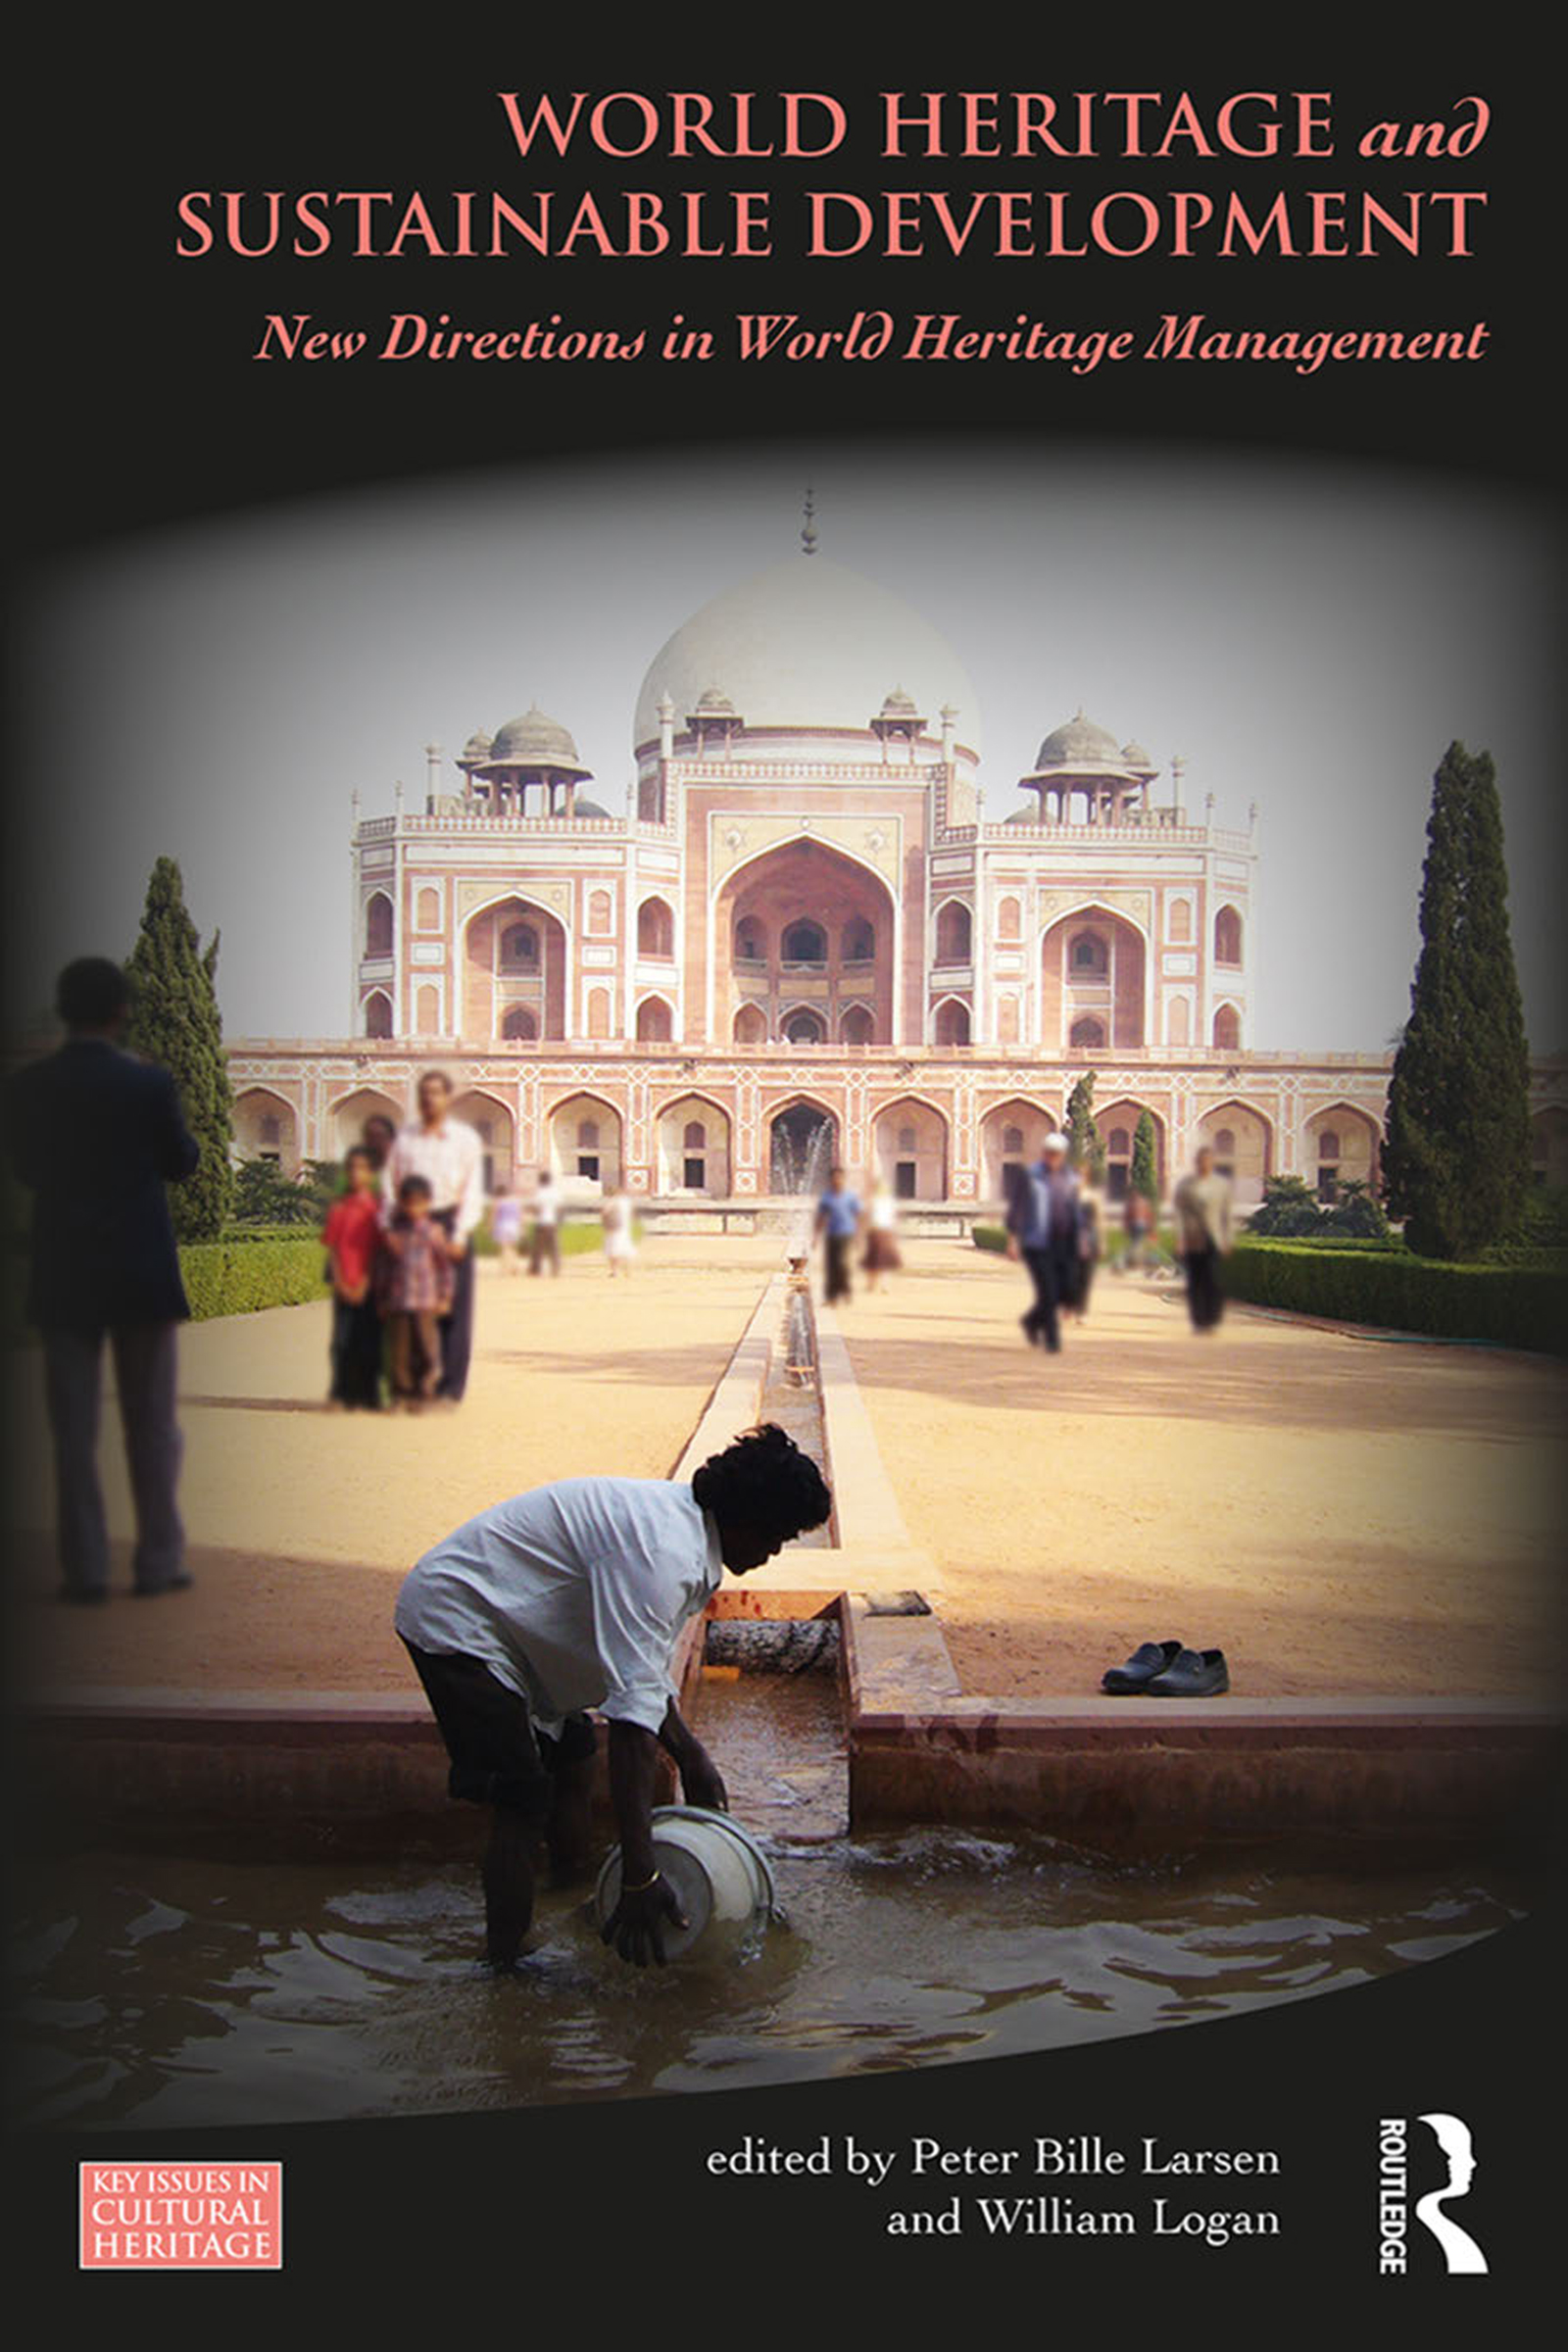 World Heritage and Sustainable Development